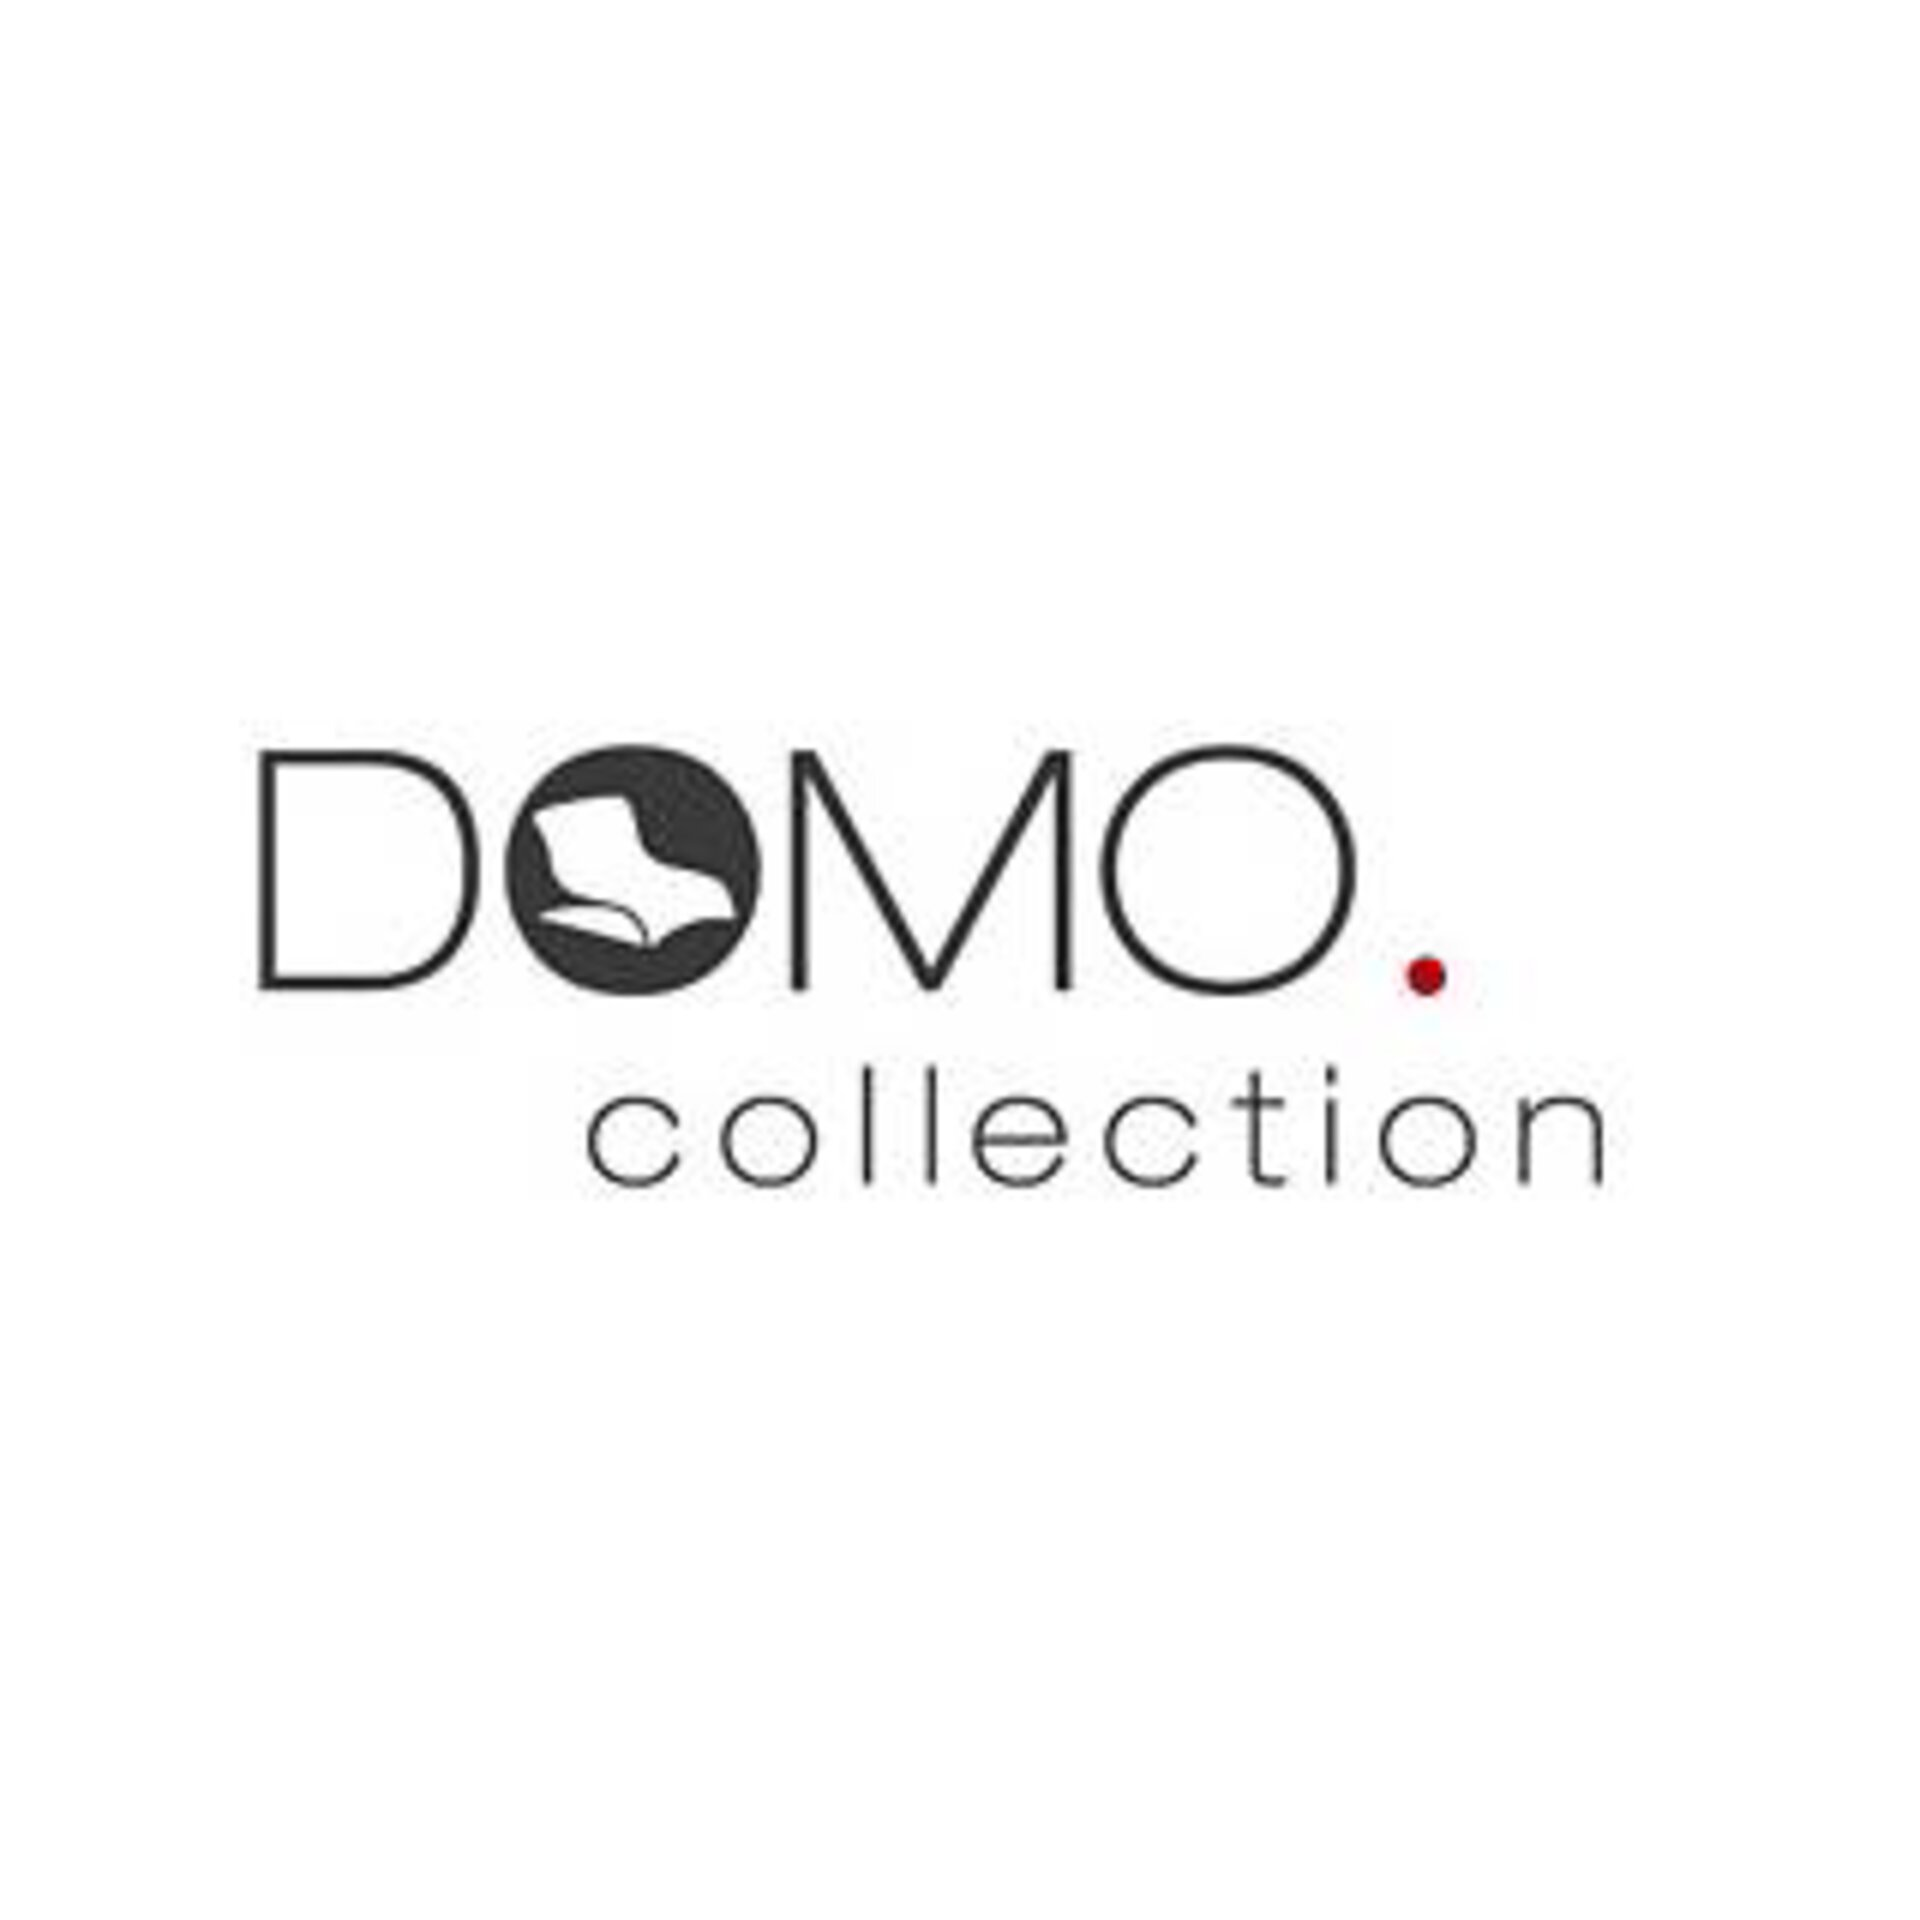 Domo Collection